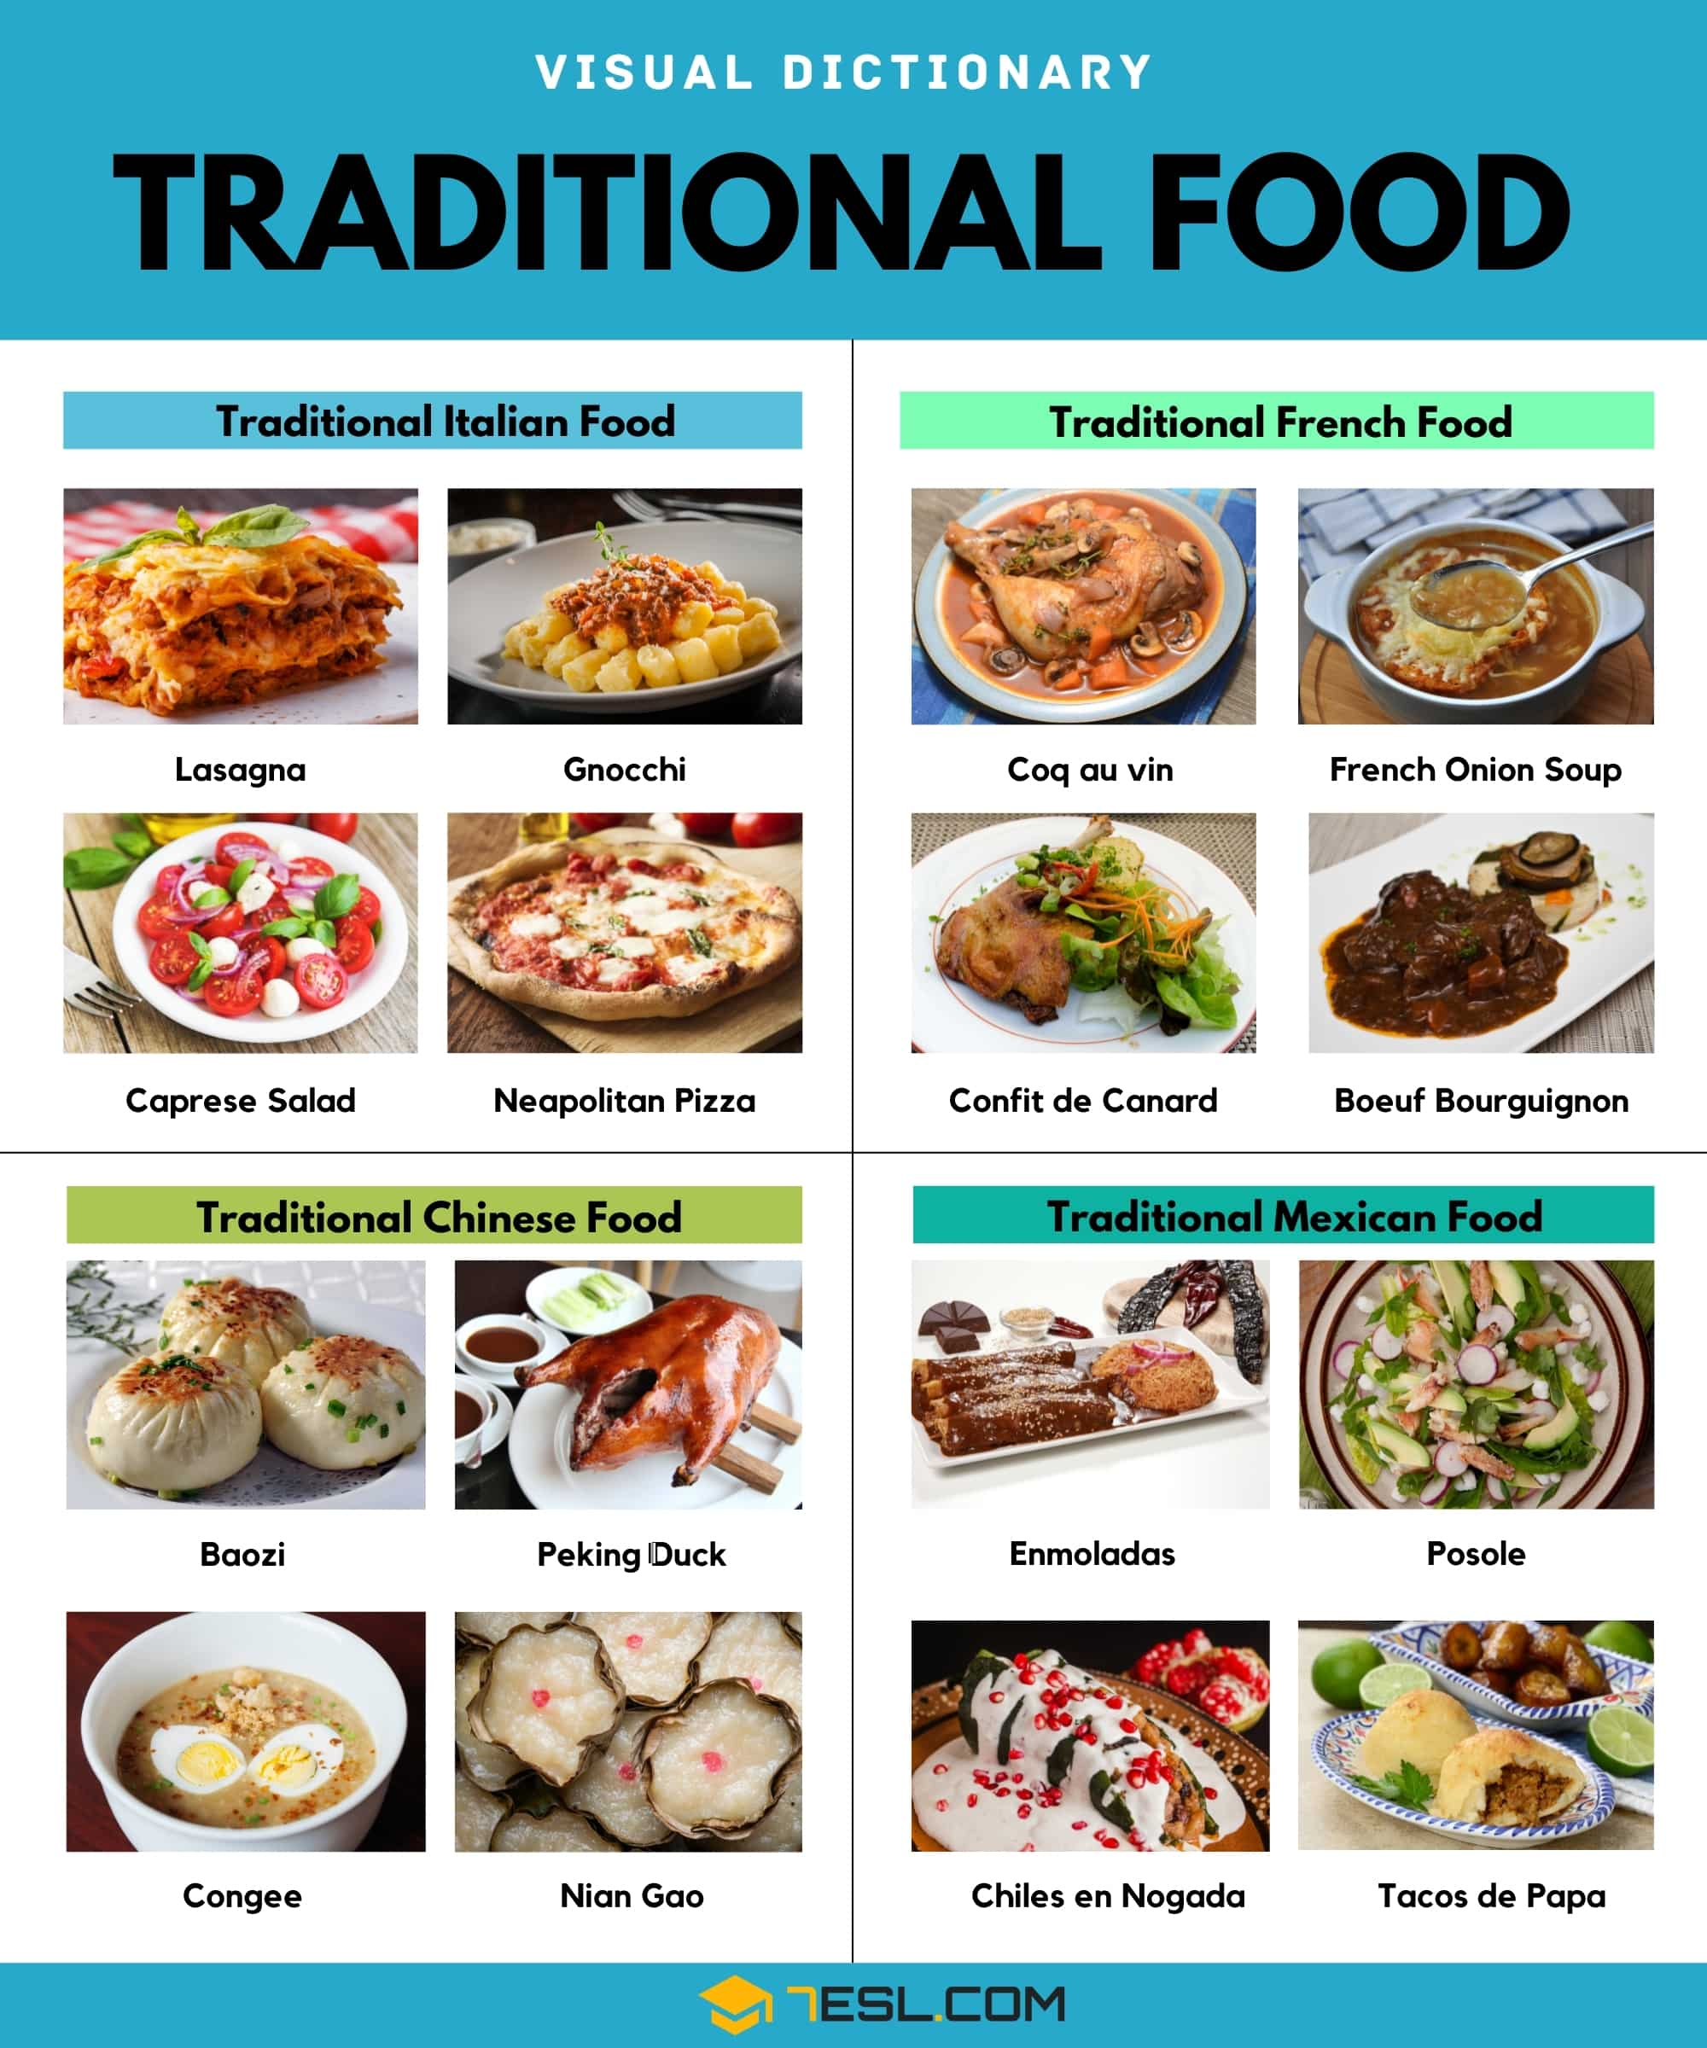 Traditional Food Around the World